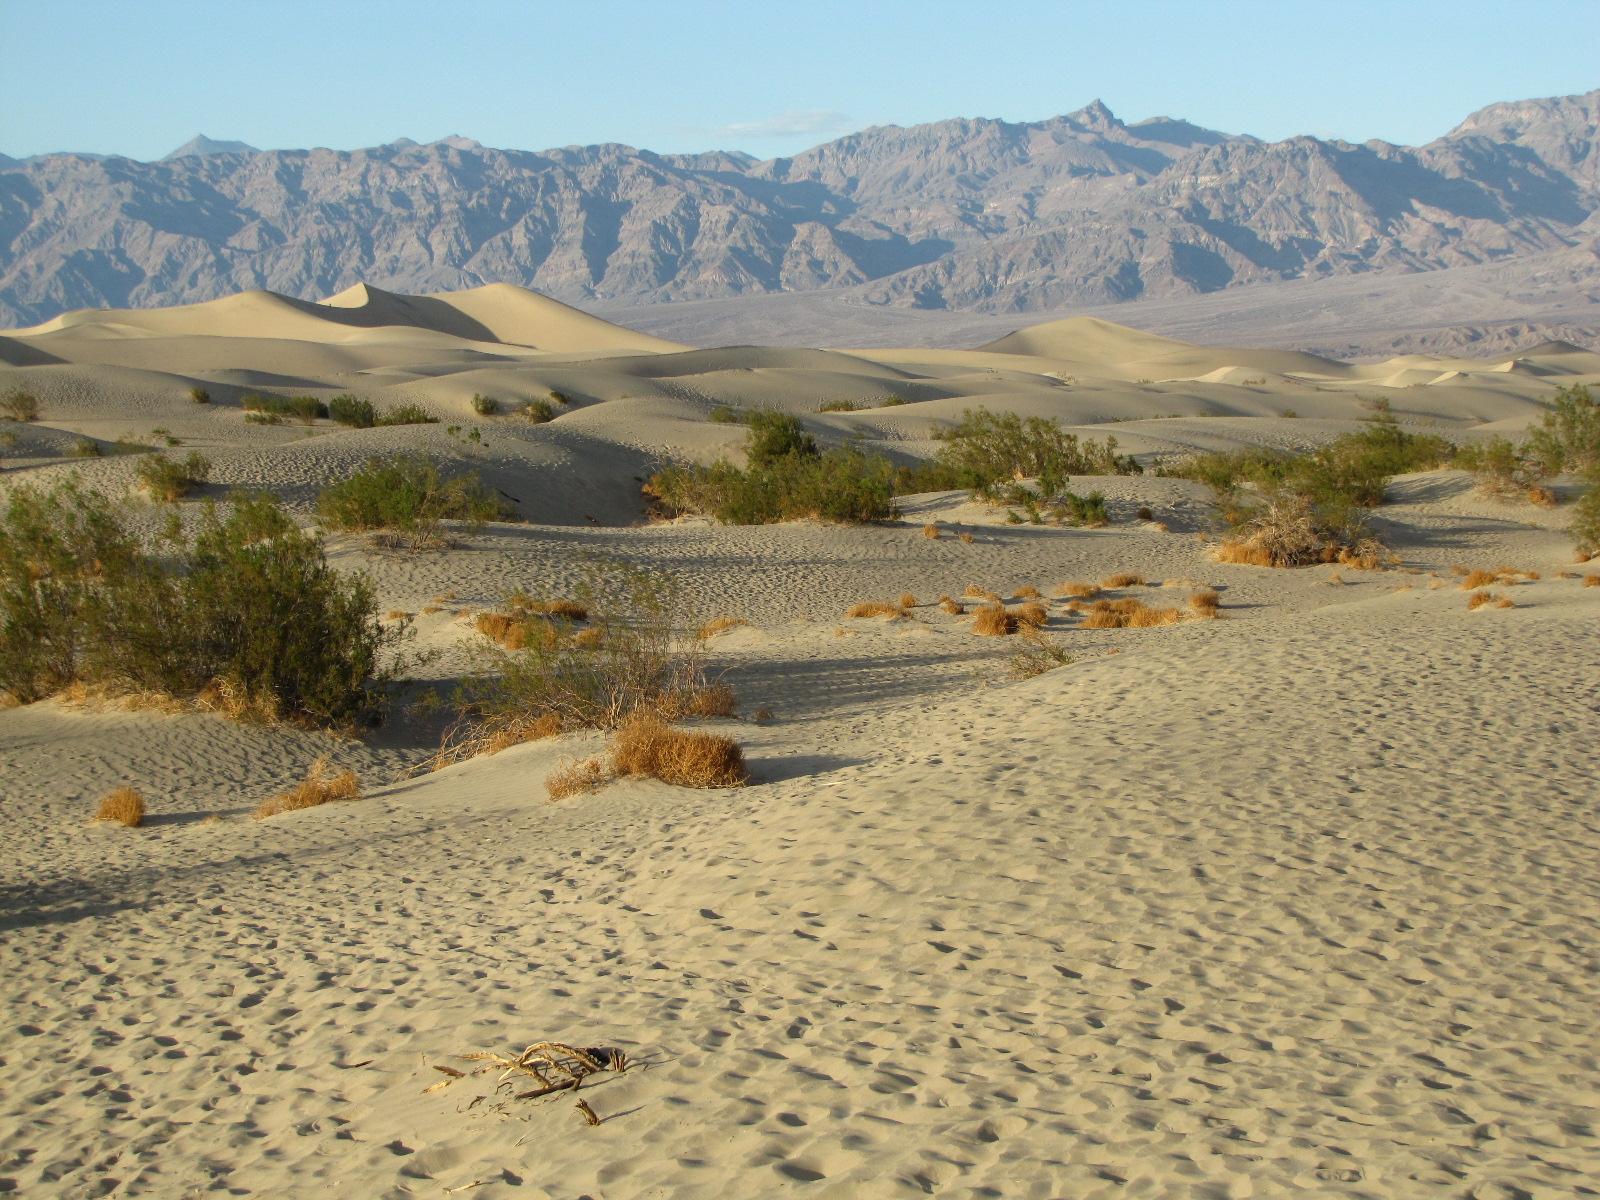 Mesquite Sand dune